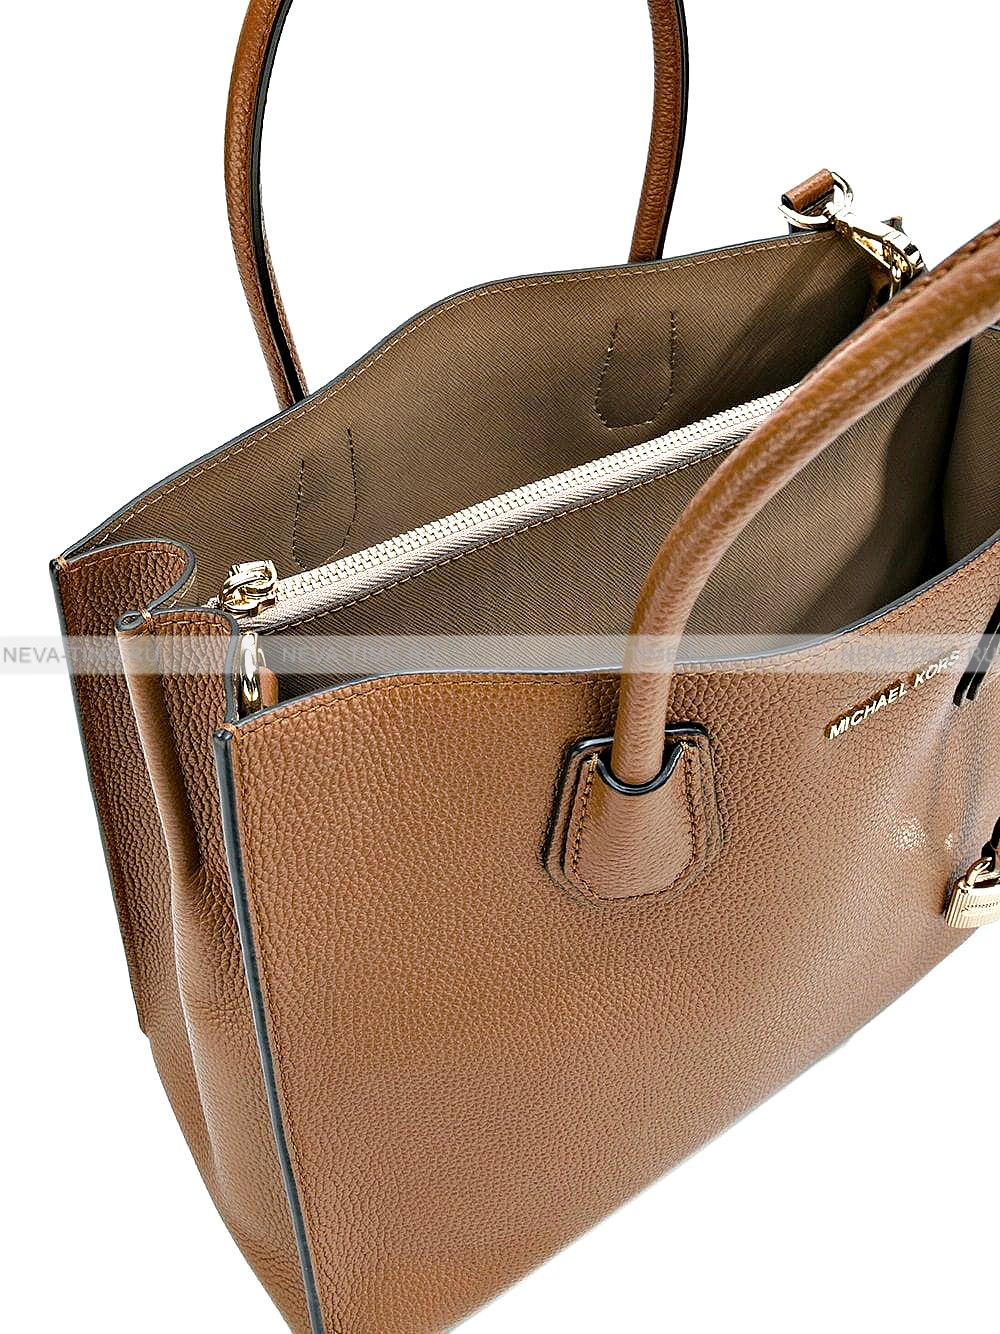 купить сумку майкла корса недорого